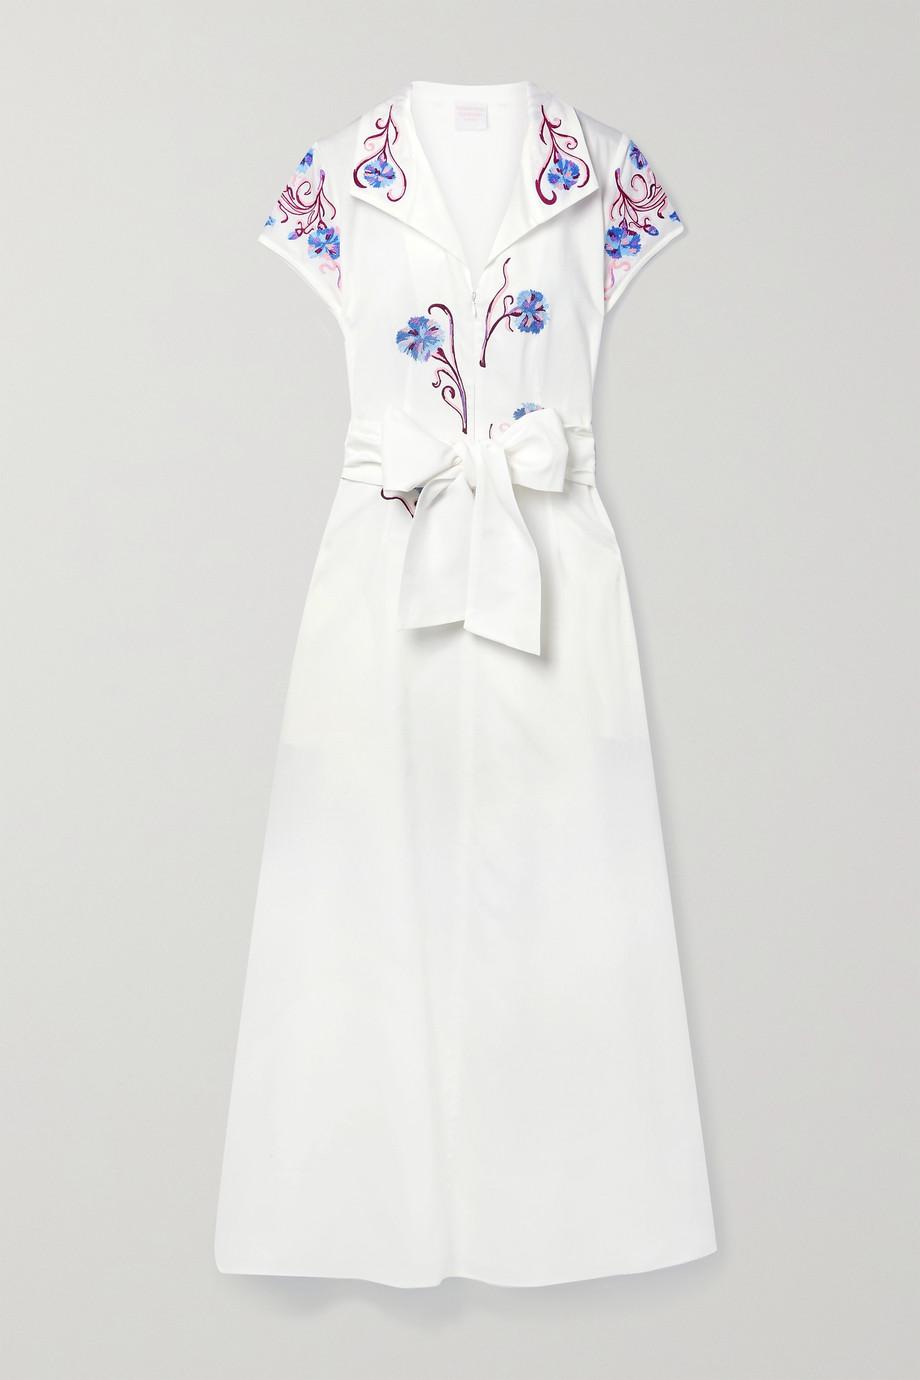 Loretta Caponi Adriana belted embroidered cotton maxi dress